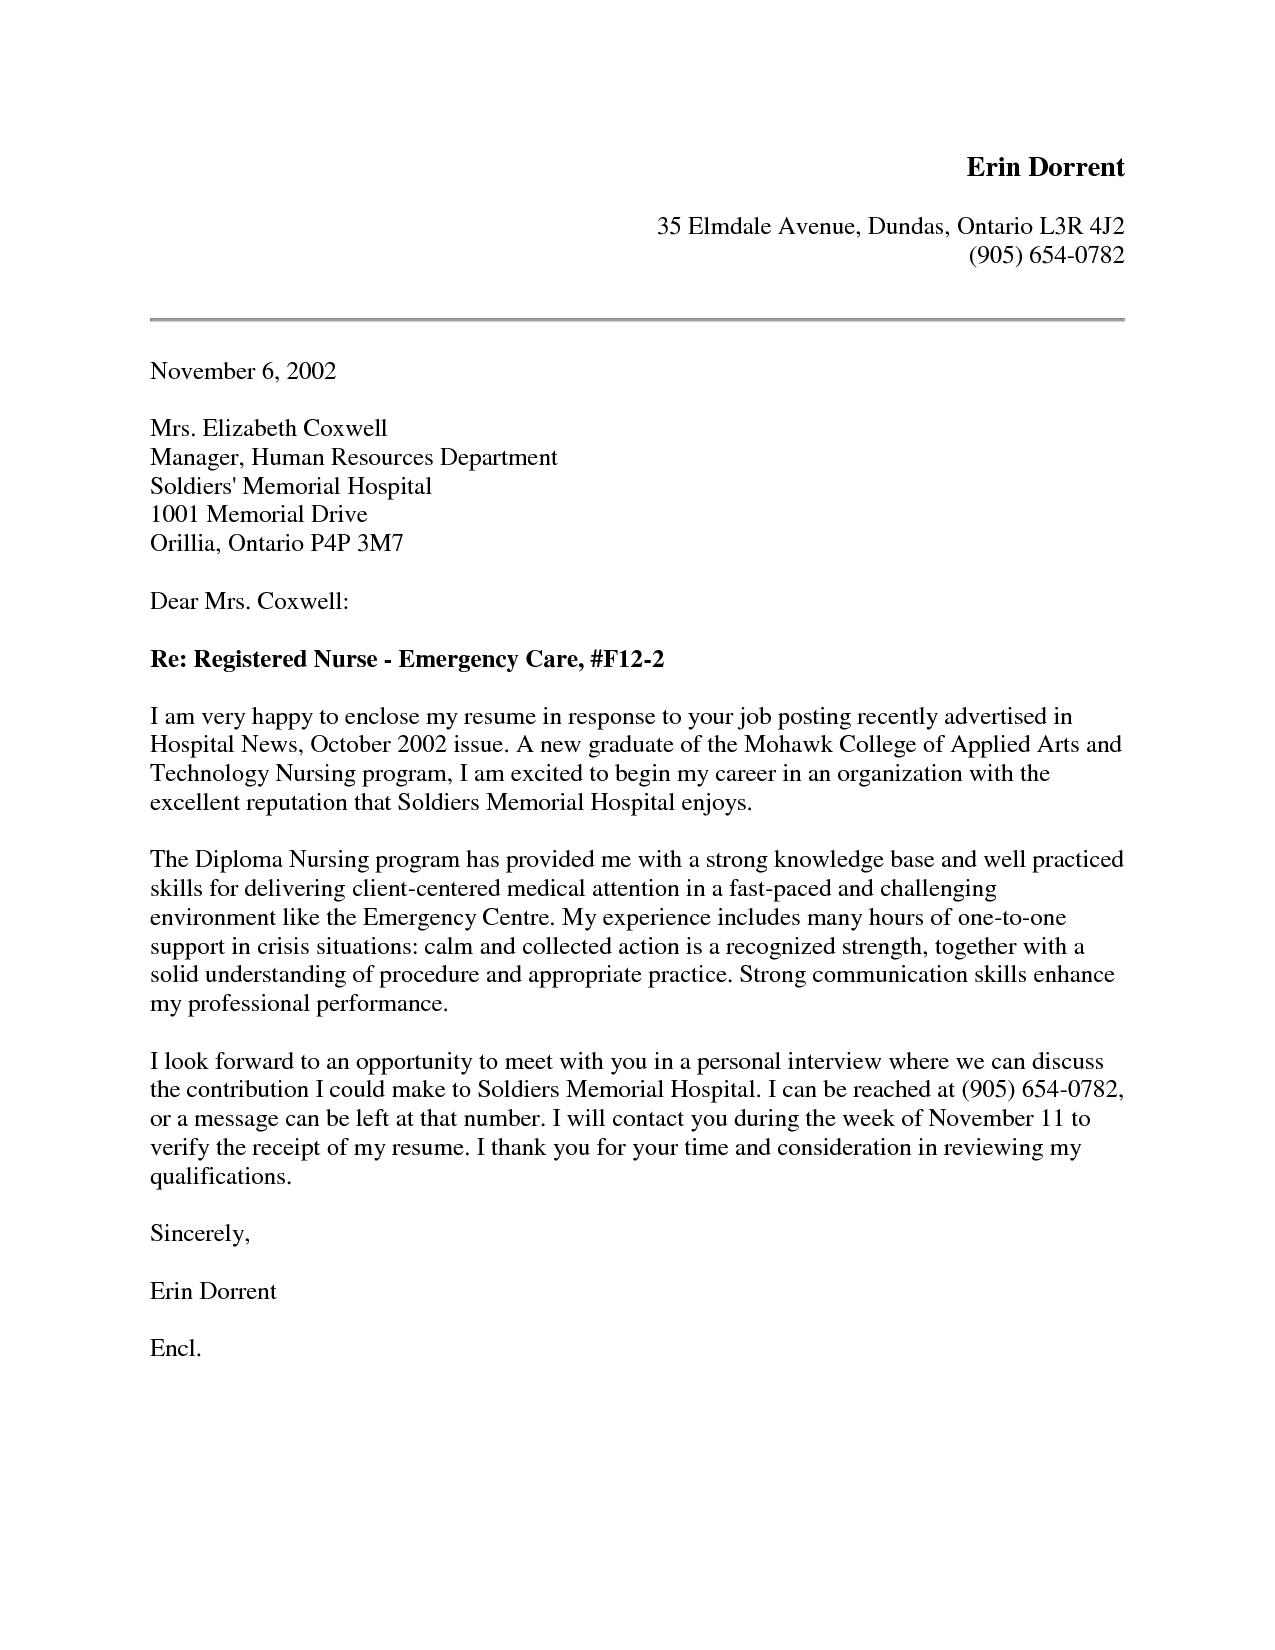 New Grad Nursing Cover Letter Google Search Cover Letter For Resume Resume Cover Letter Examples Job Cover Letter